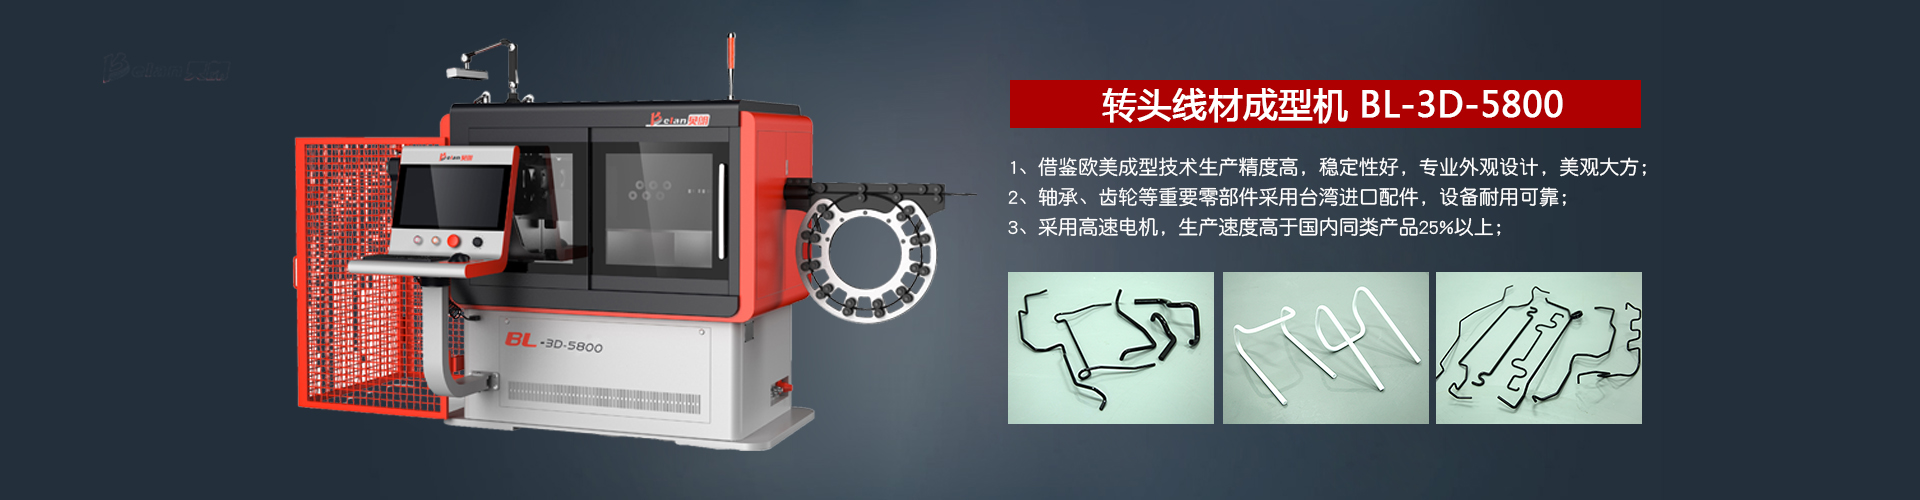 zhuan头线cai成型机